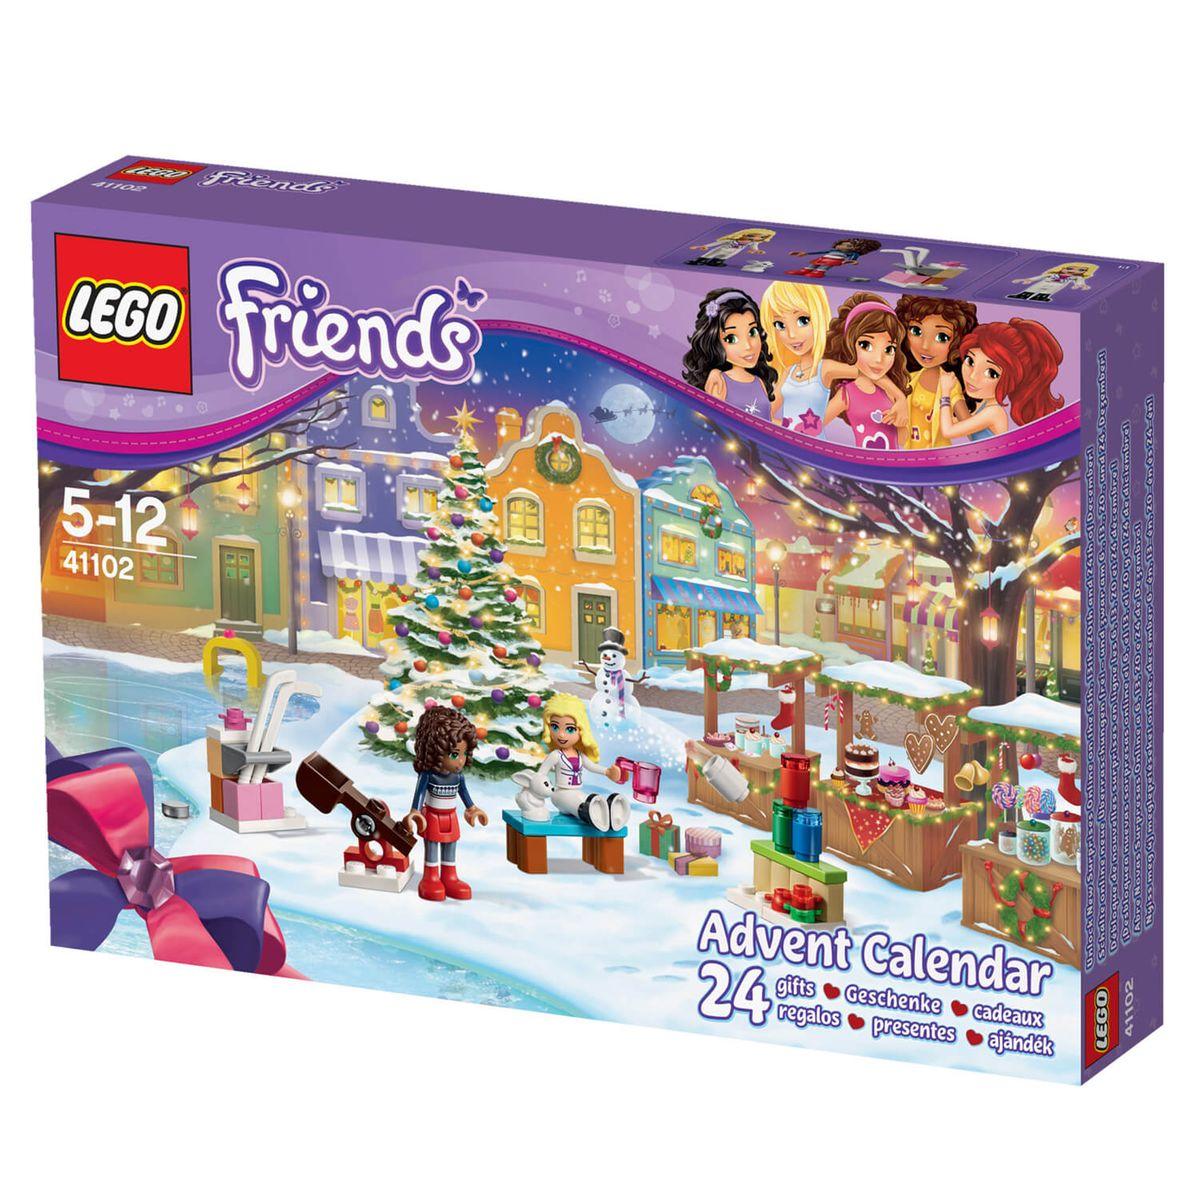 Lego 41102 friends : calendrier de l'avent Lego